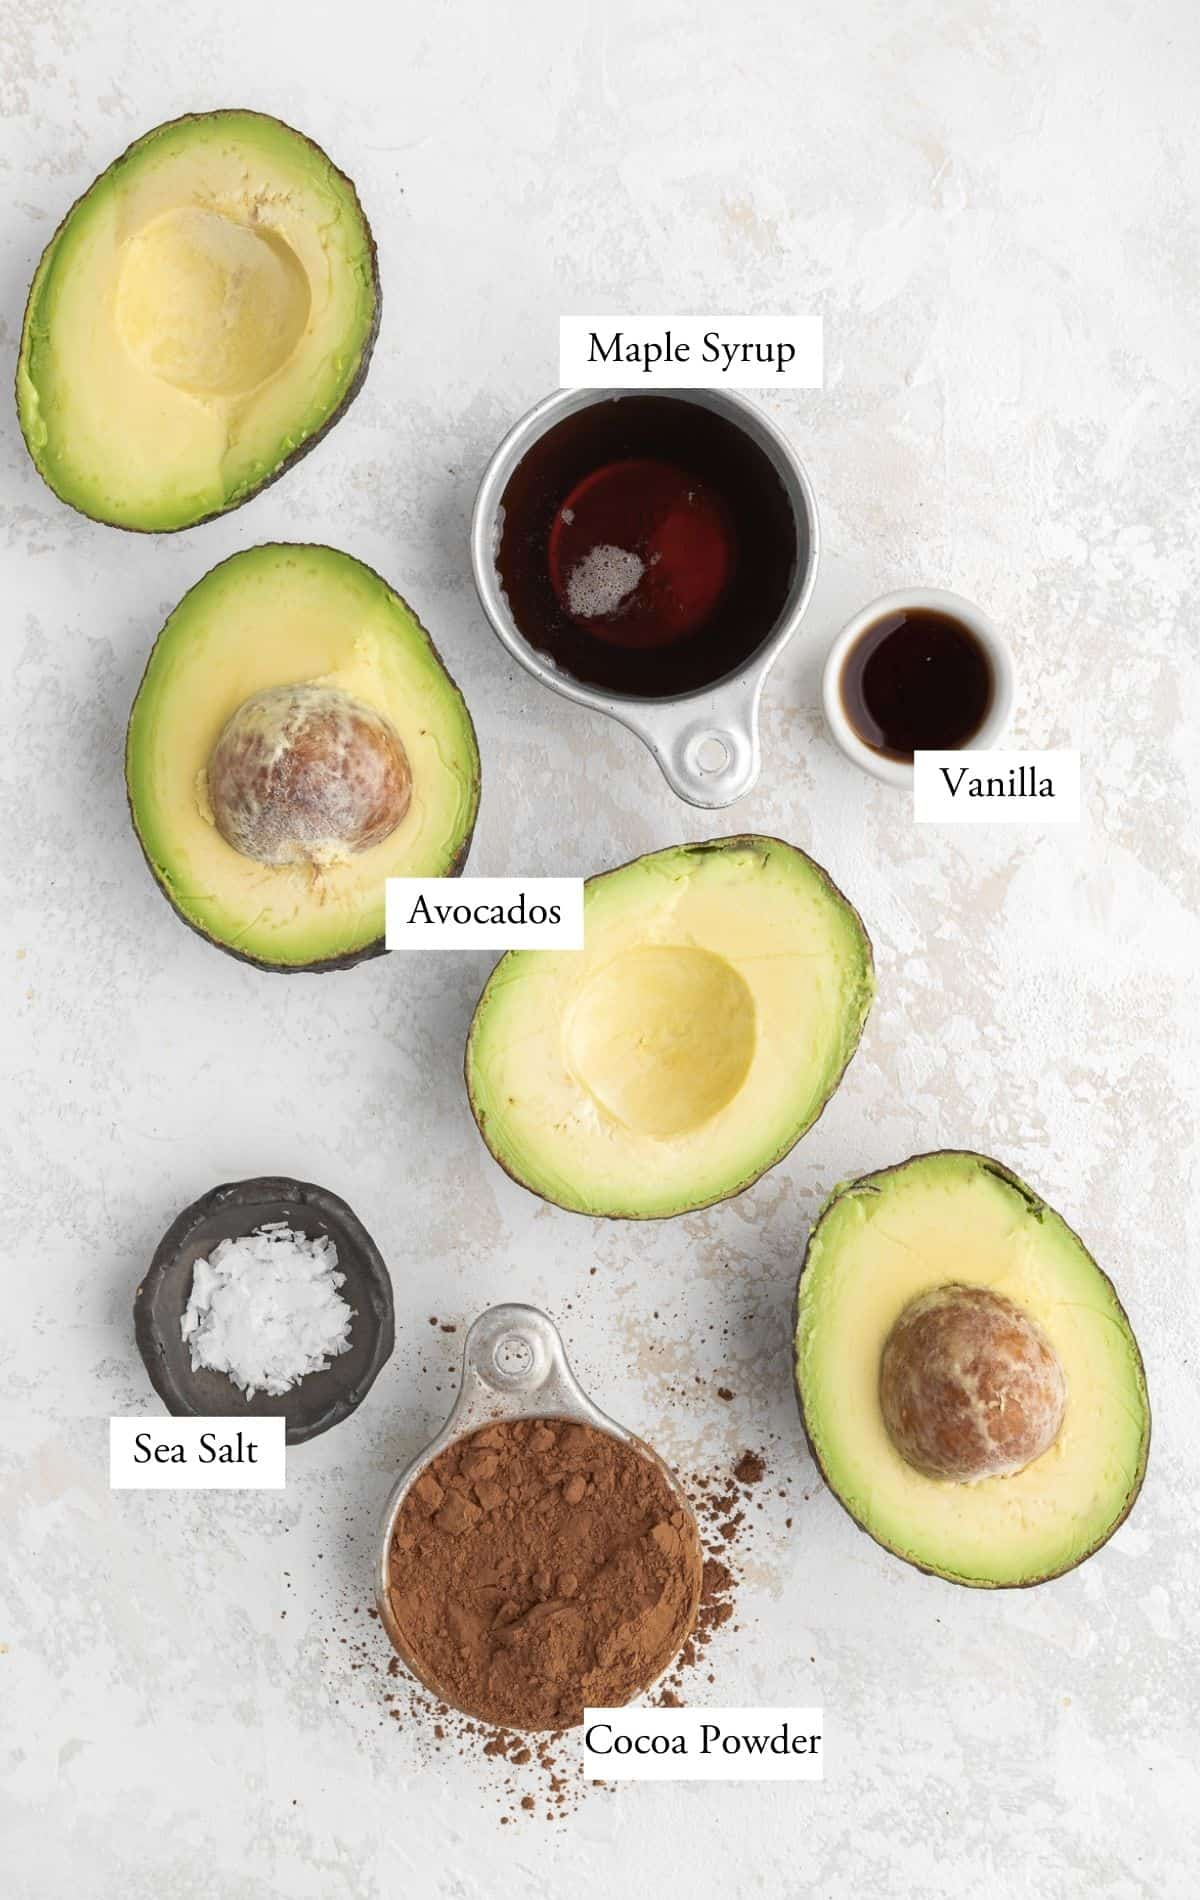 chocolate avocado mousse ingredients: cocoa powder, avocado, sea salt, vanilla, and maple syrup